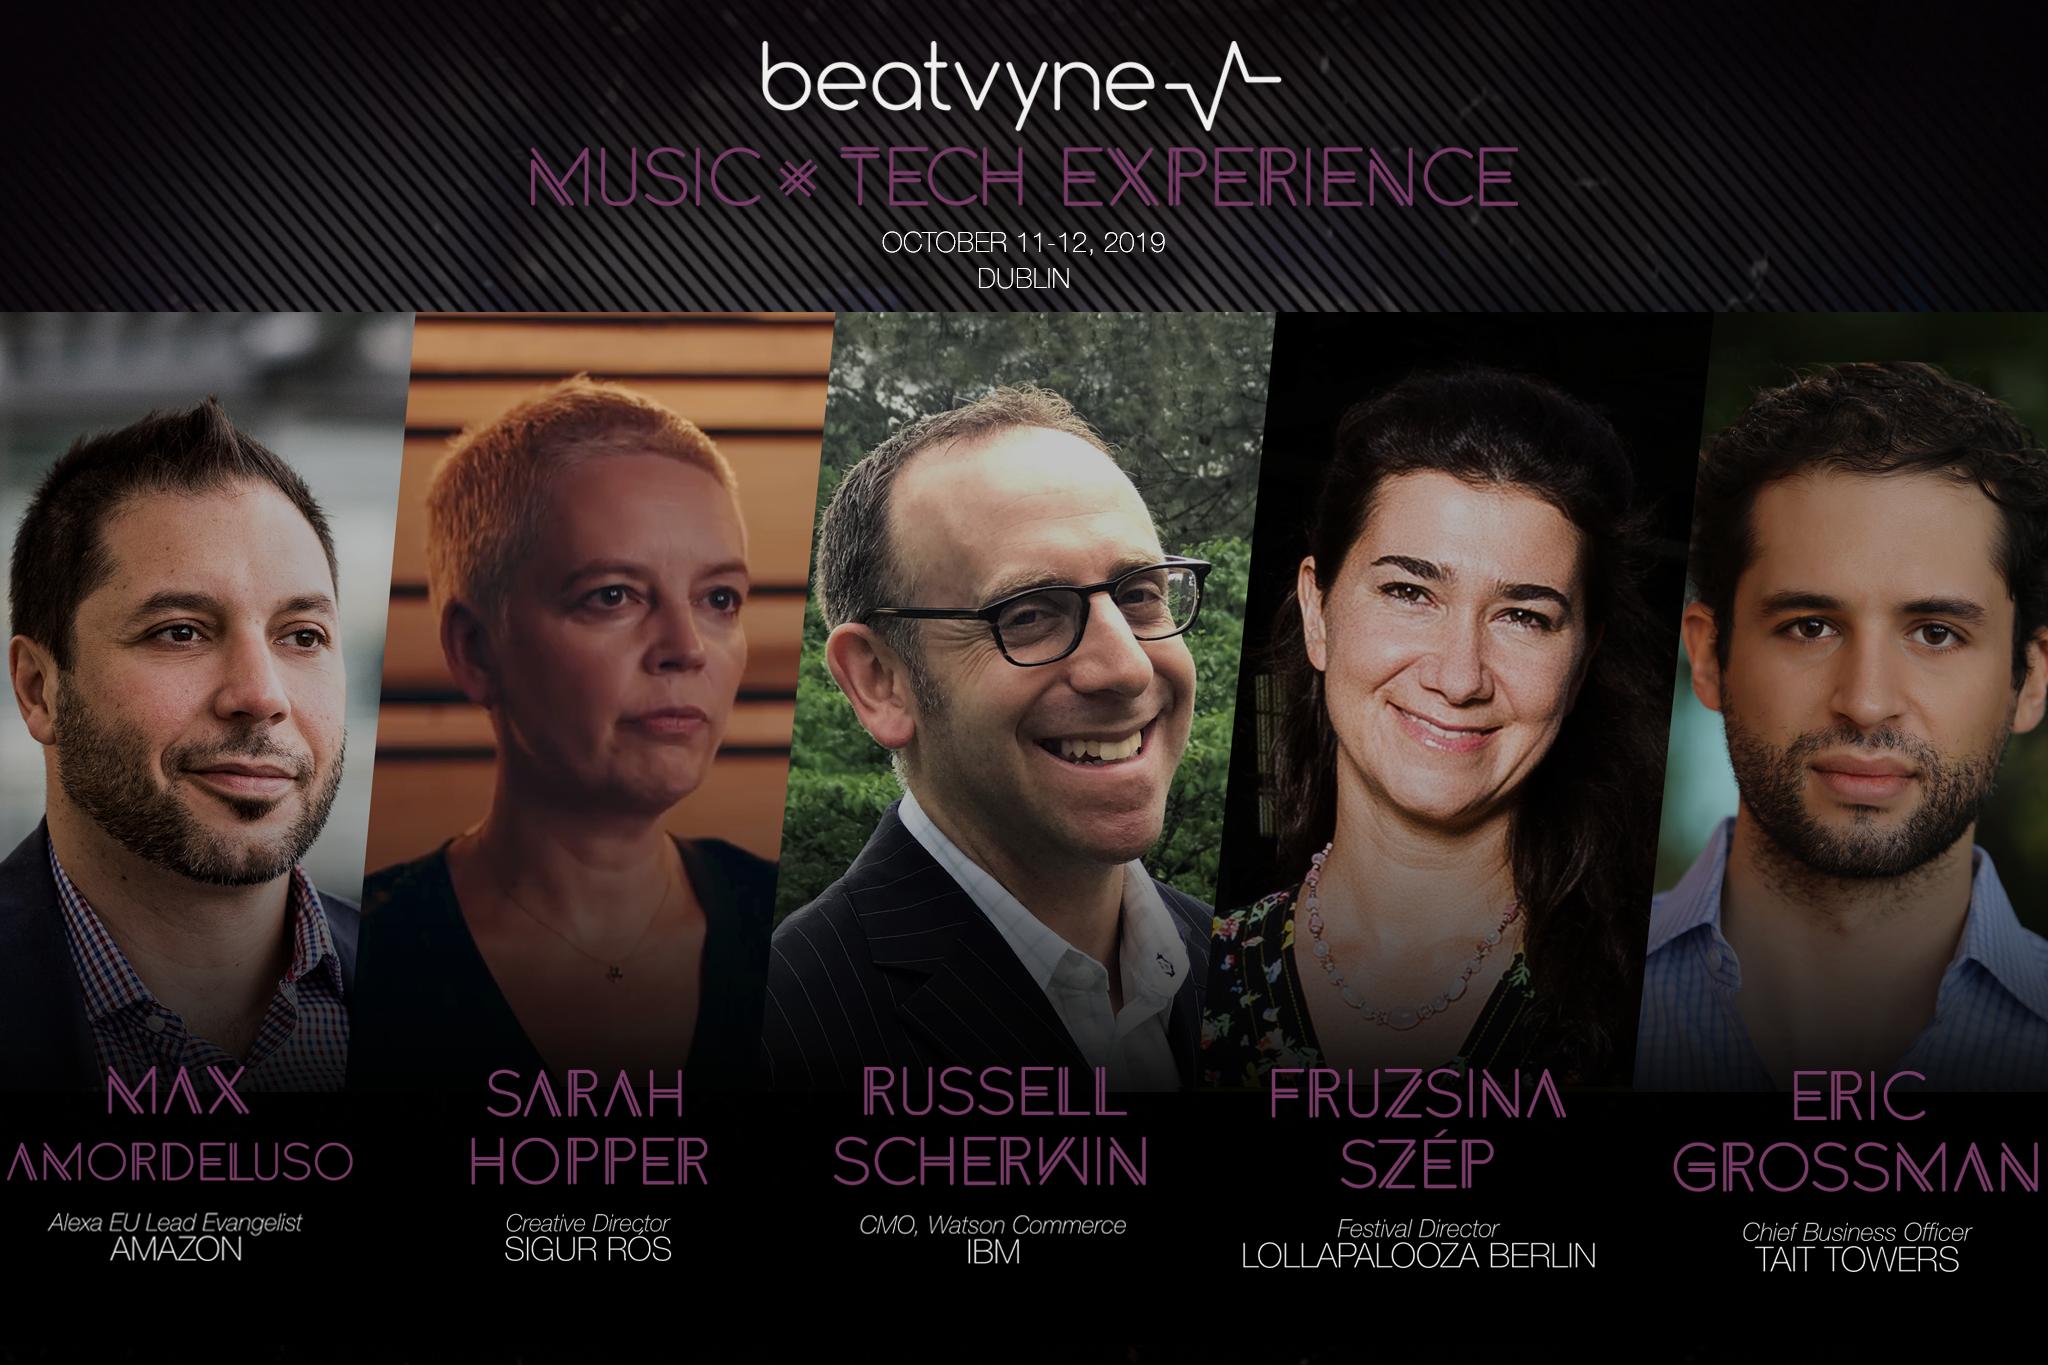 Beatvyne's Music x Tech Experience returns to Dublin | Oct 11-12, 2019